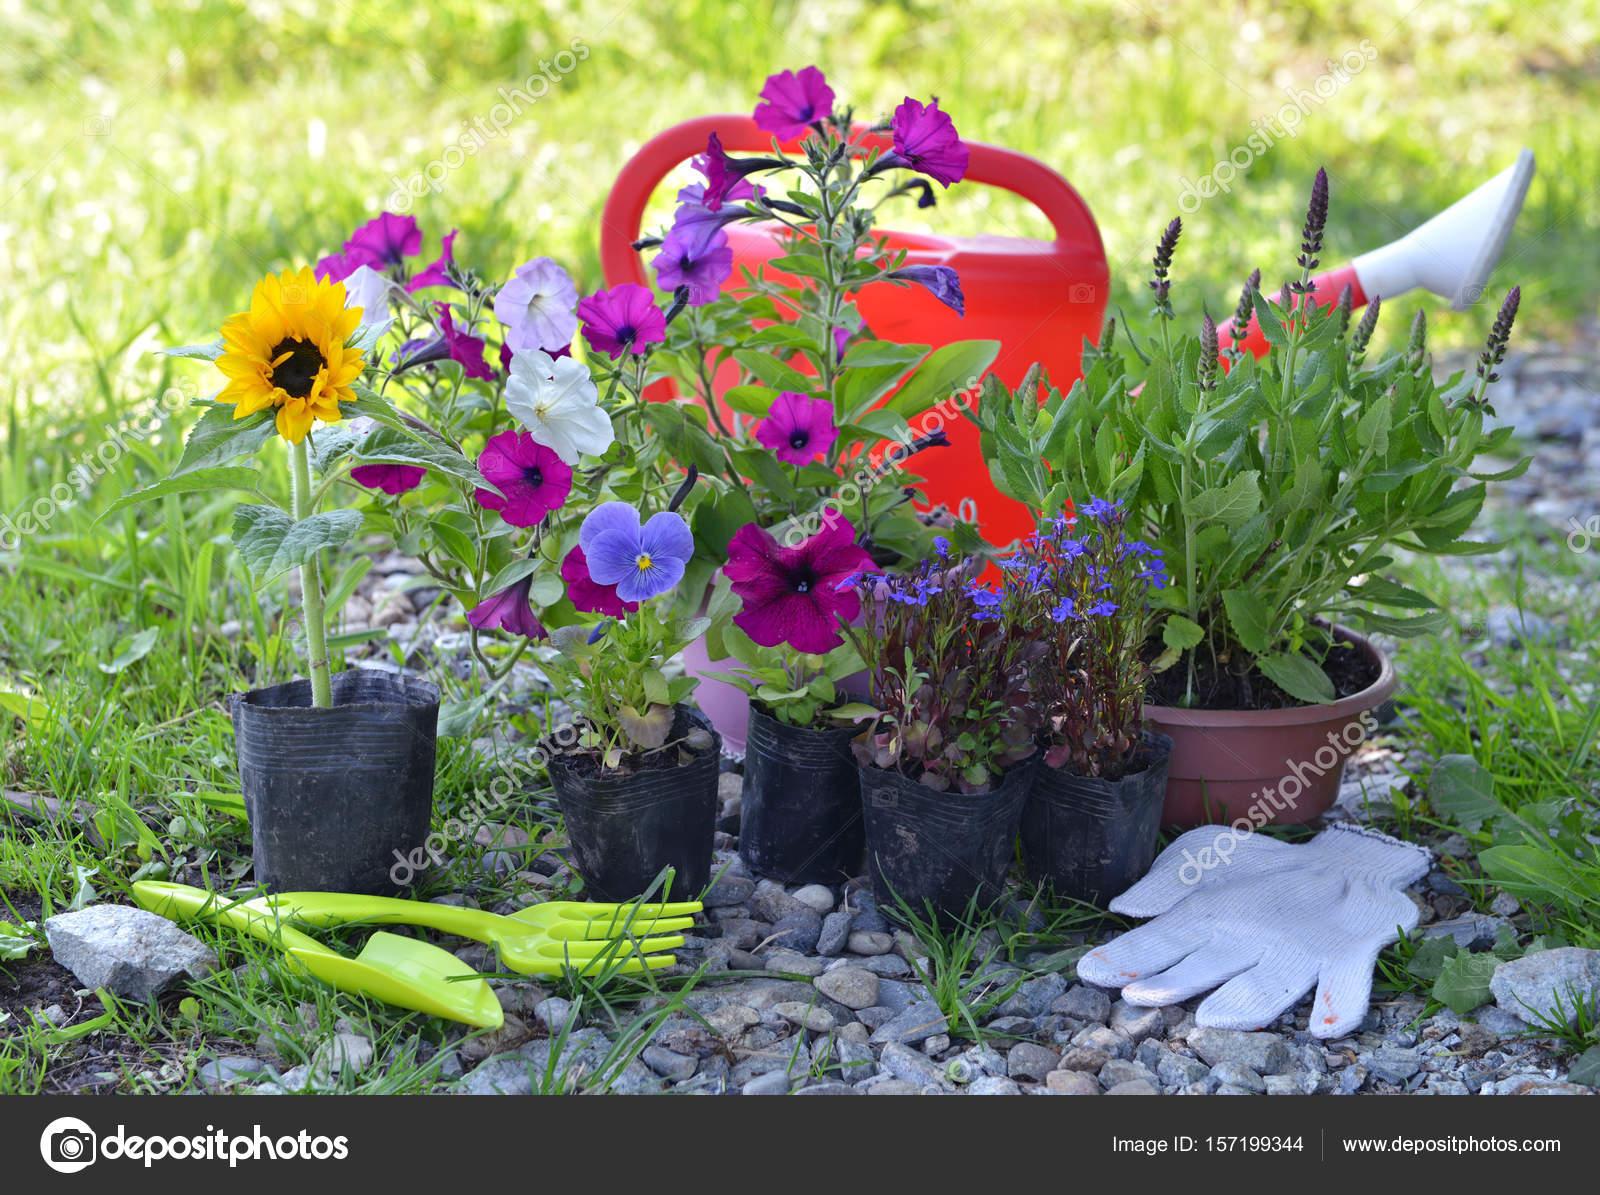 jardin nature morte avec outils arrosoir et fleurs d t. Black Bedroom Furniture Sets. Home Design Ideas